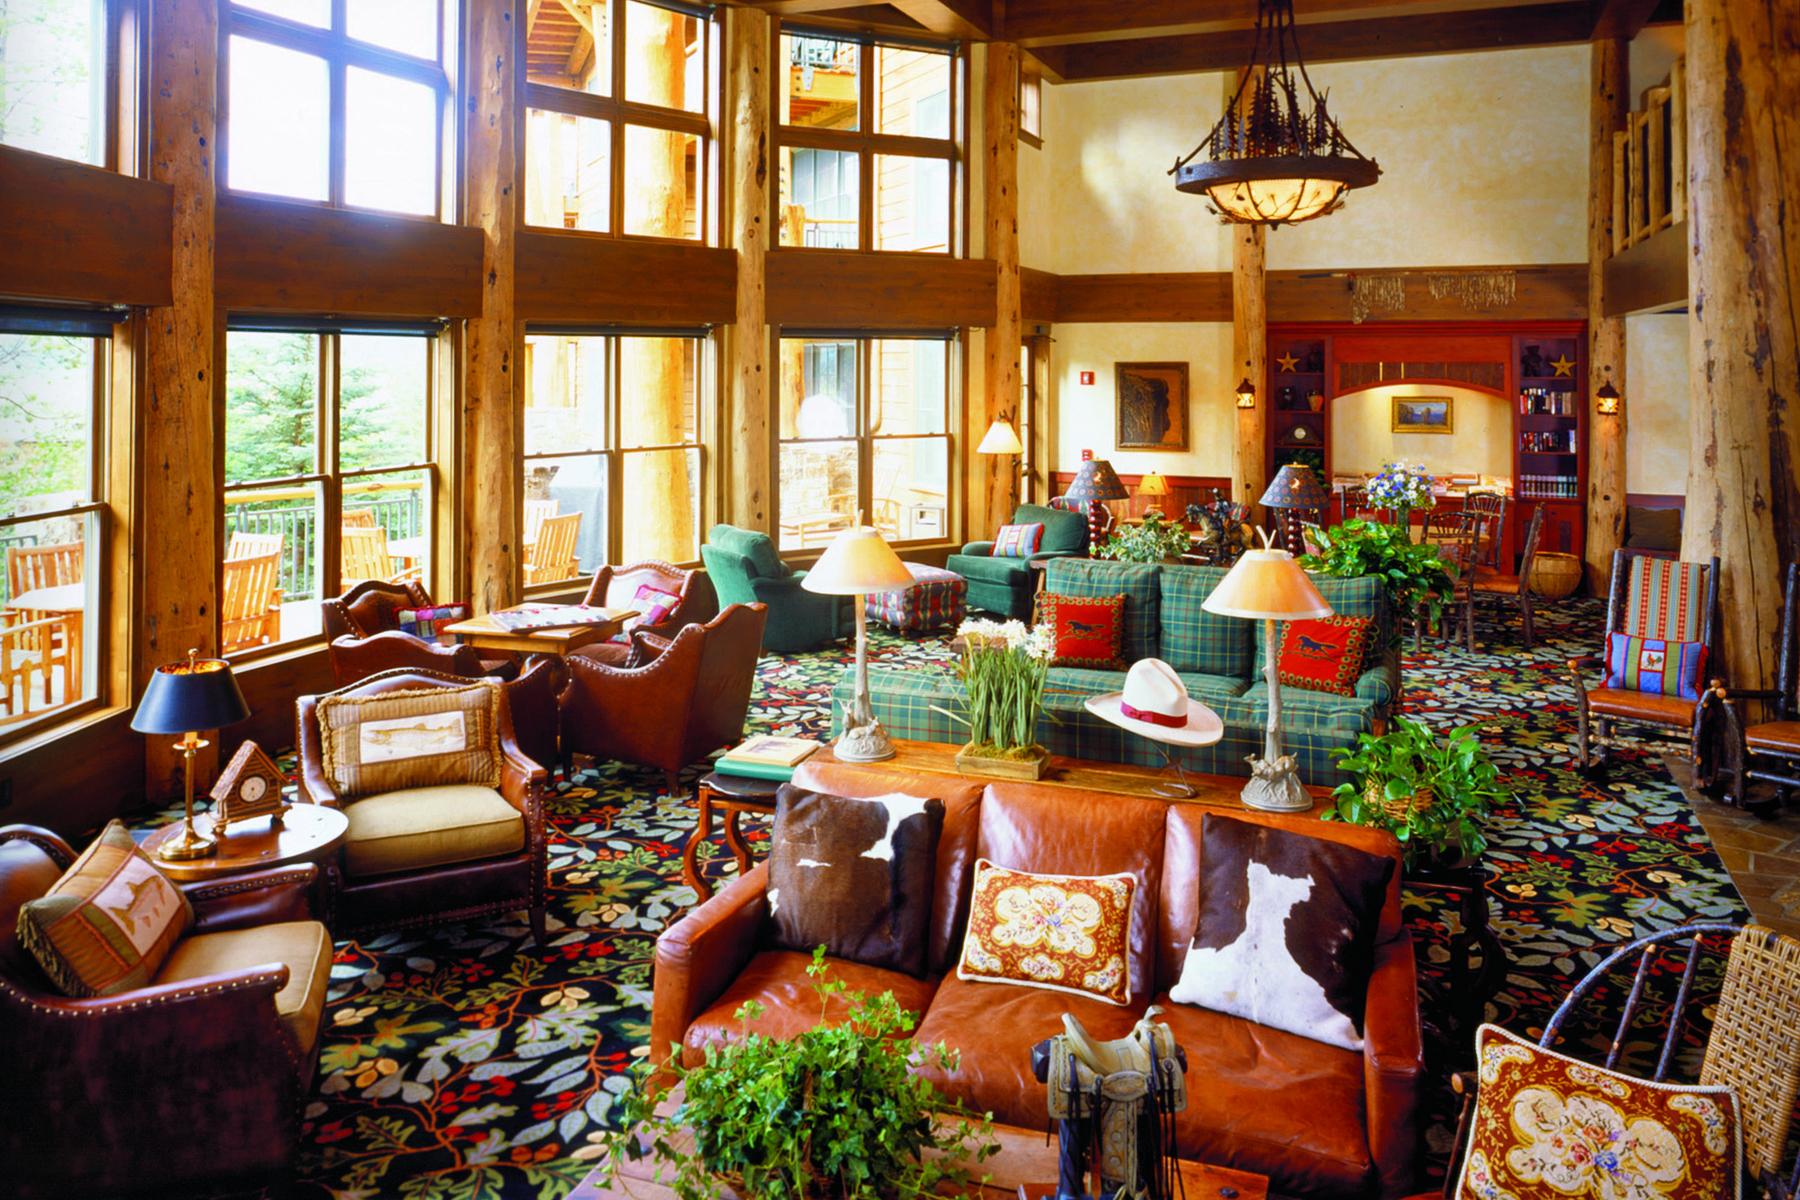 Fractional Ownership for Sale at Teton Club 2 Summer Weeks 3340 W Cody Dr Teton Village, Wyoming, 83025 Jackson Hole, United States